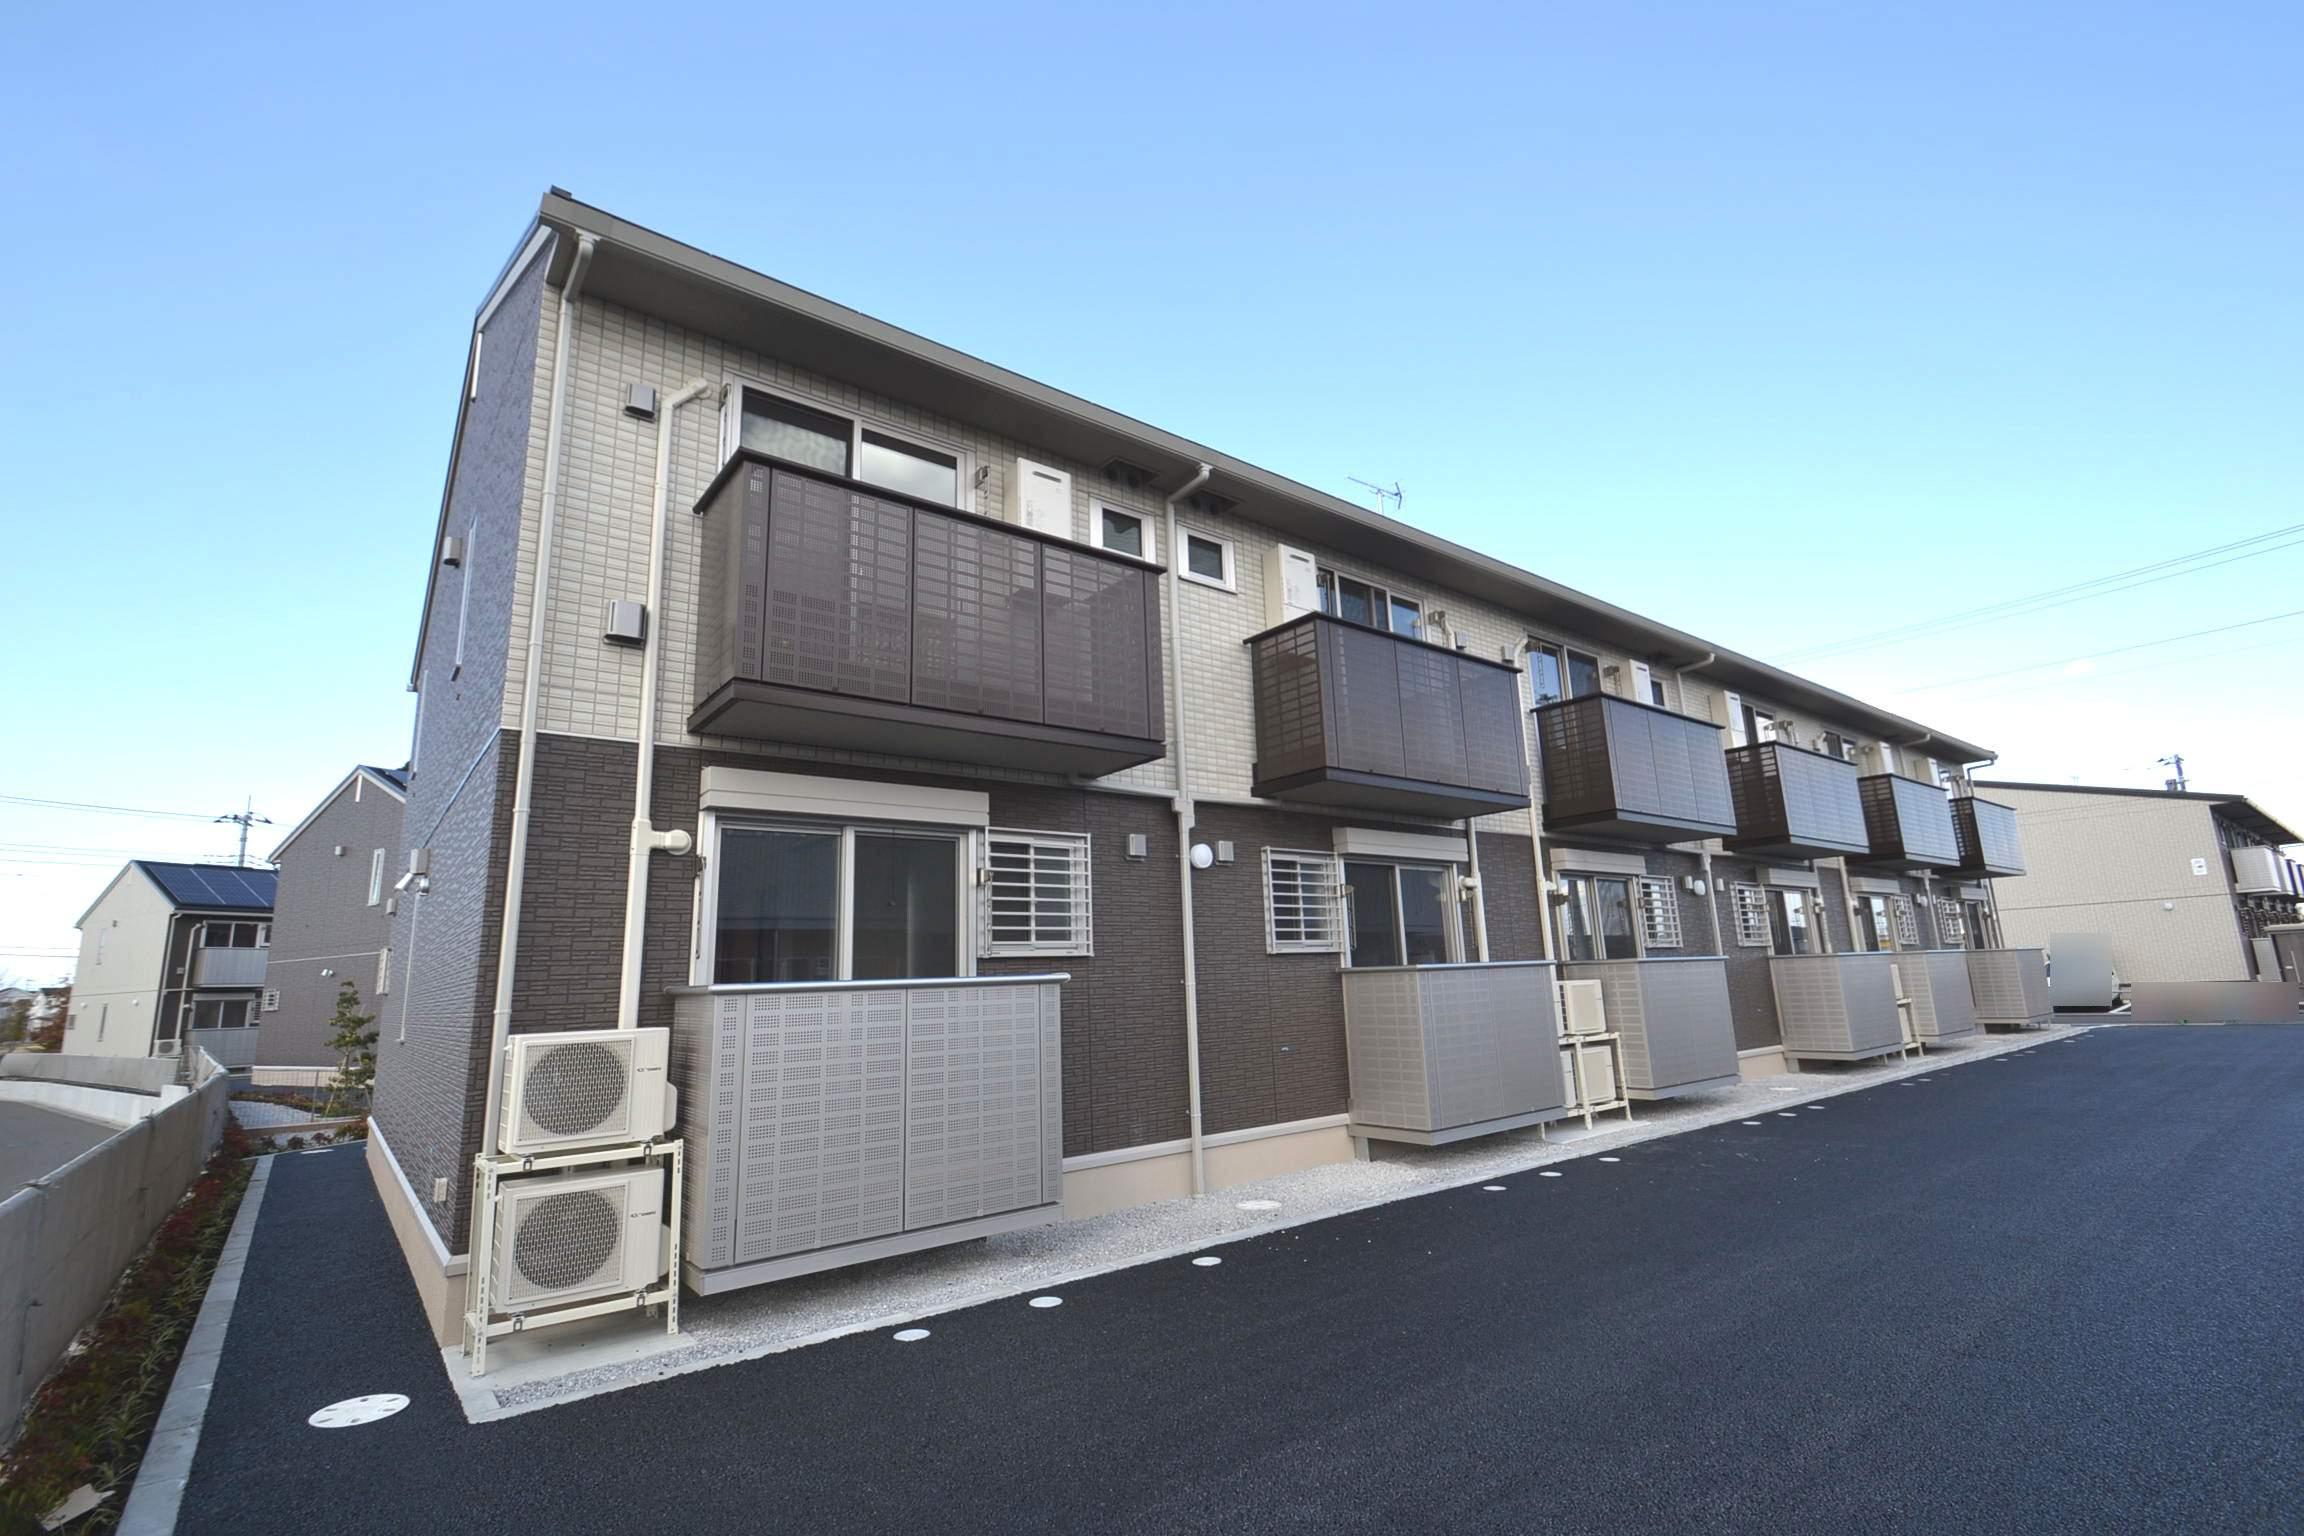 新着賃貸6:栃木県宇都宮市ゆいの杜7丁目の新着賃貸物件